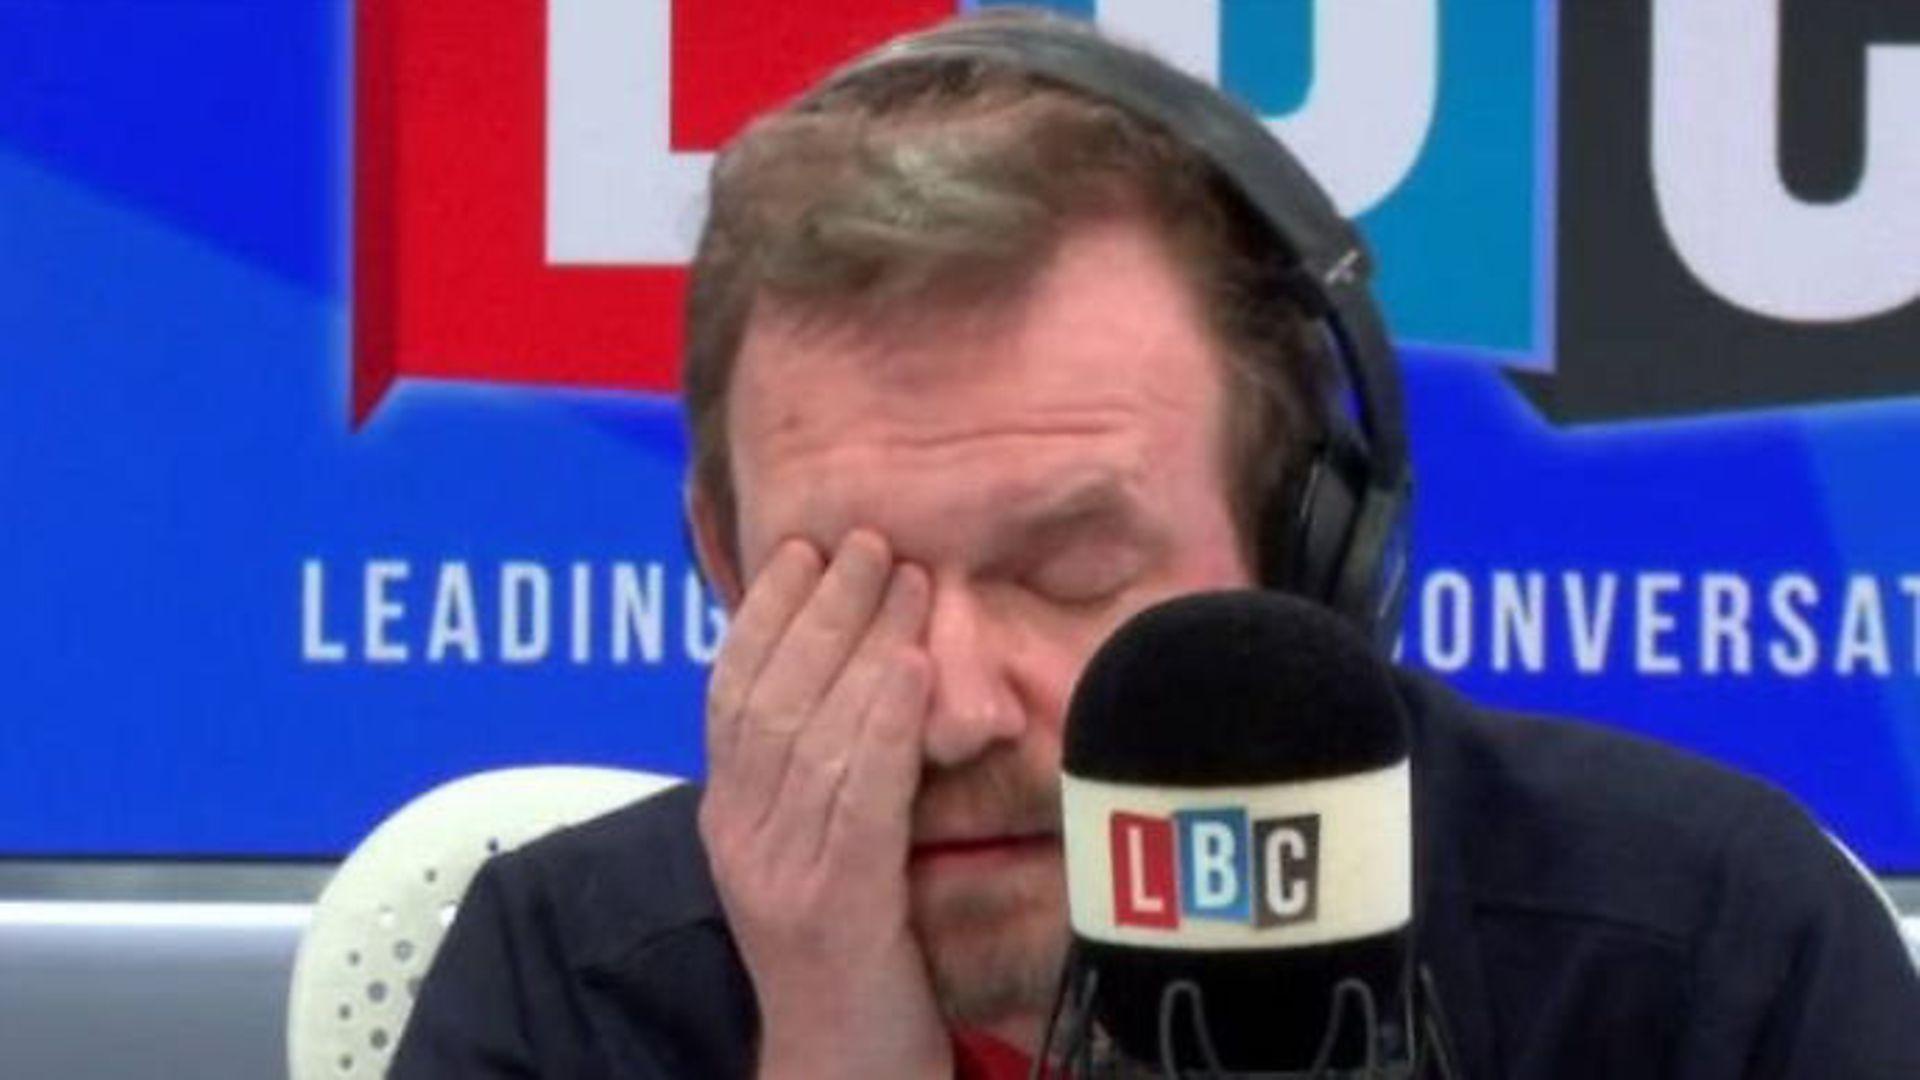 James O'Brien appears on his LBC radio programme - Credit: LBC/Global